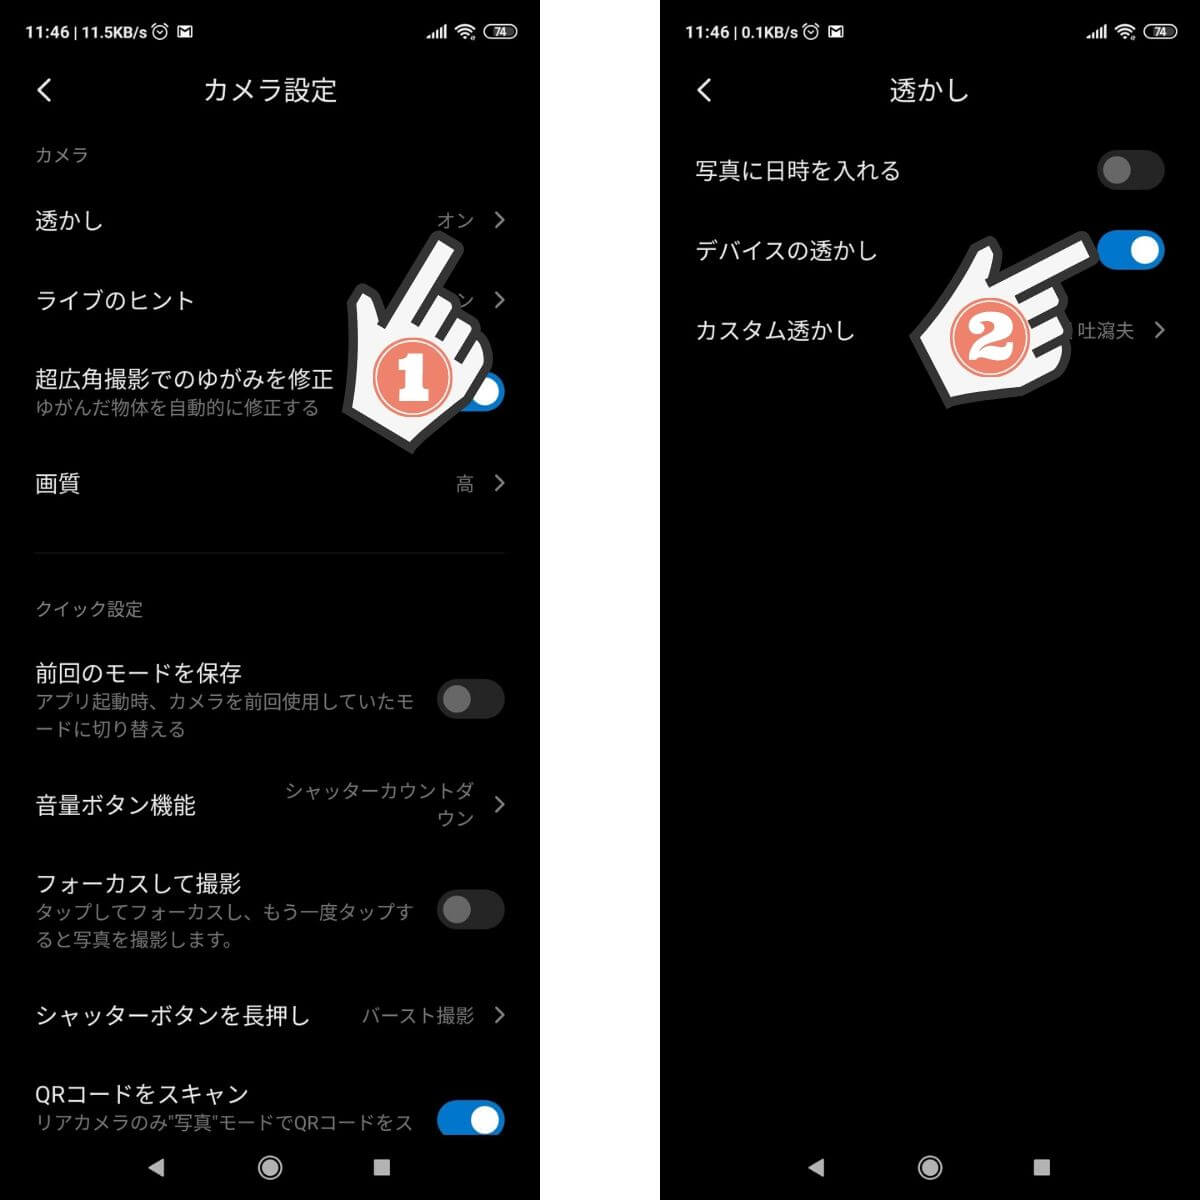 Xiaomi Redmi Note 9sのカメラ画像左下のロゴテキストを消す方法